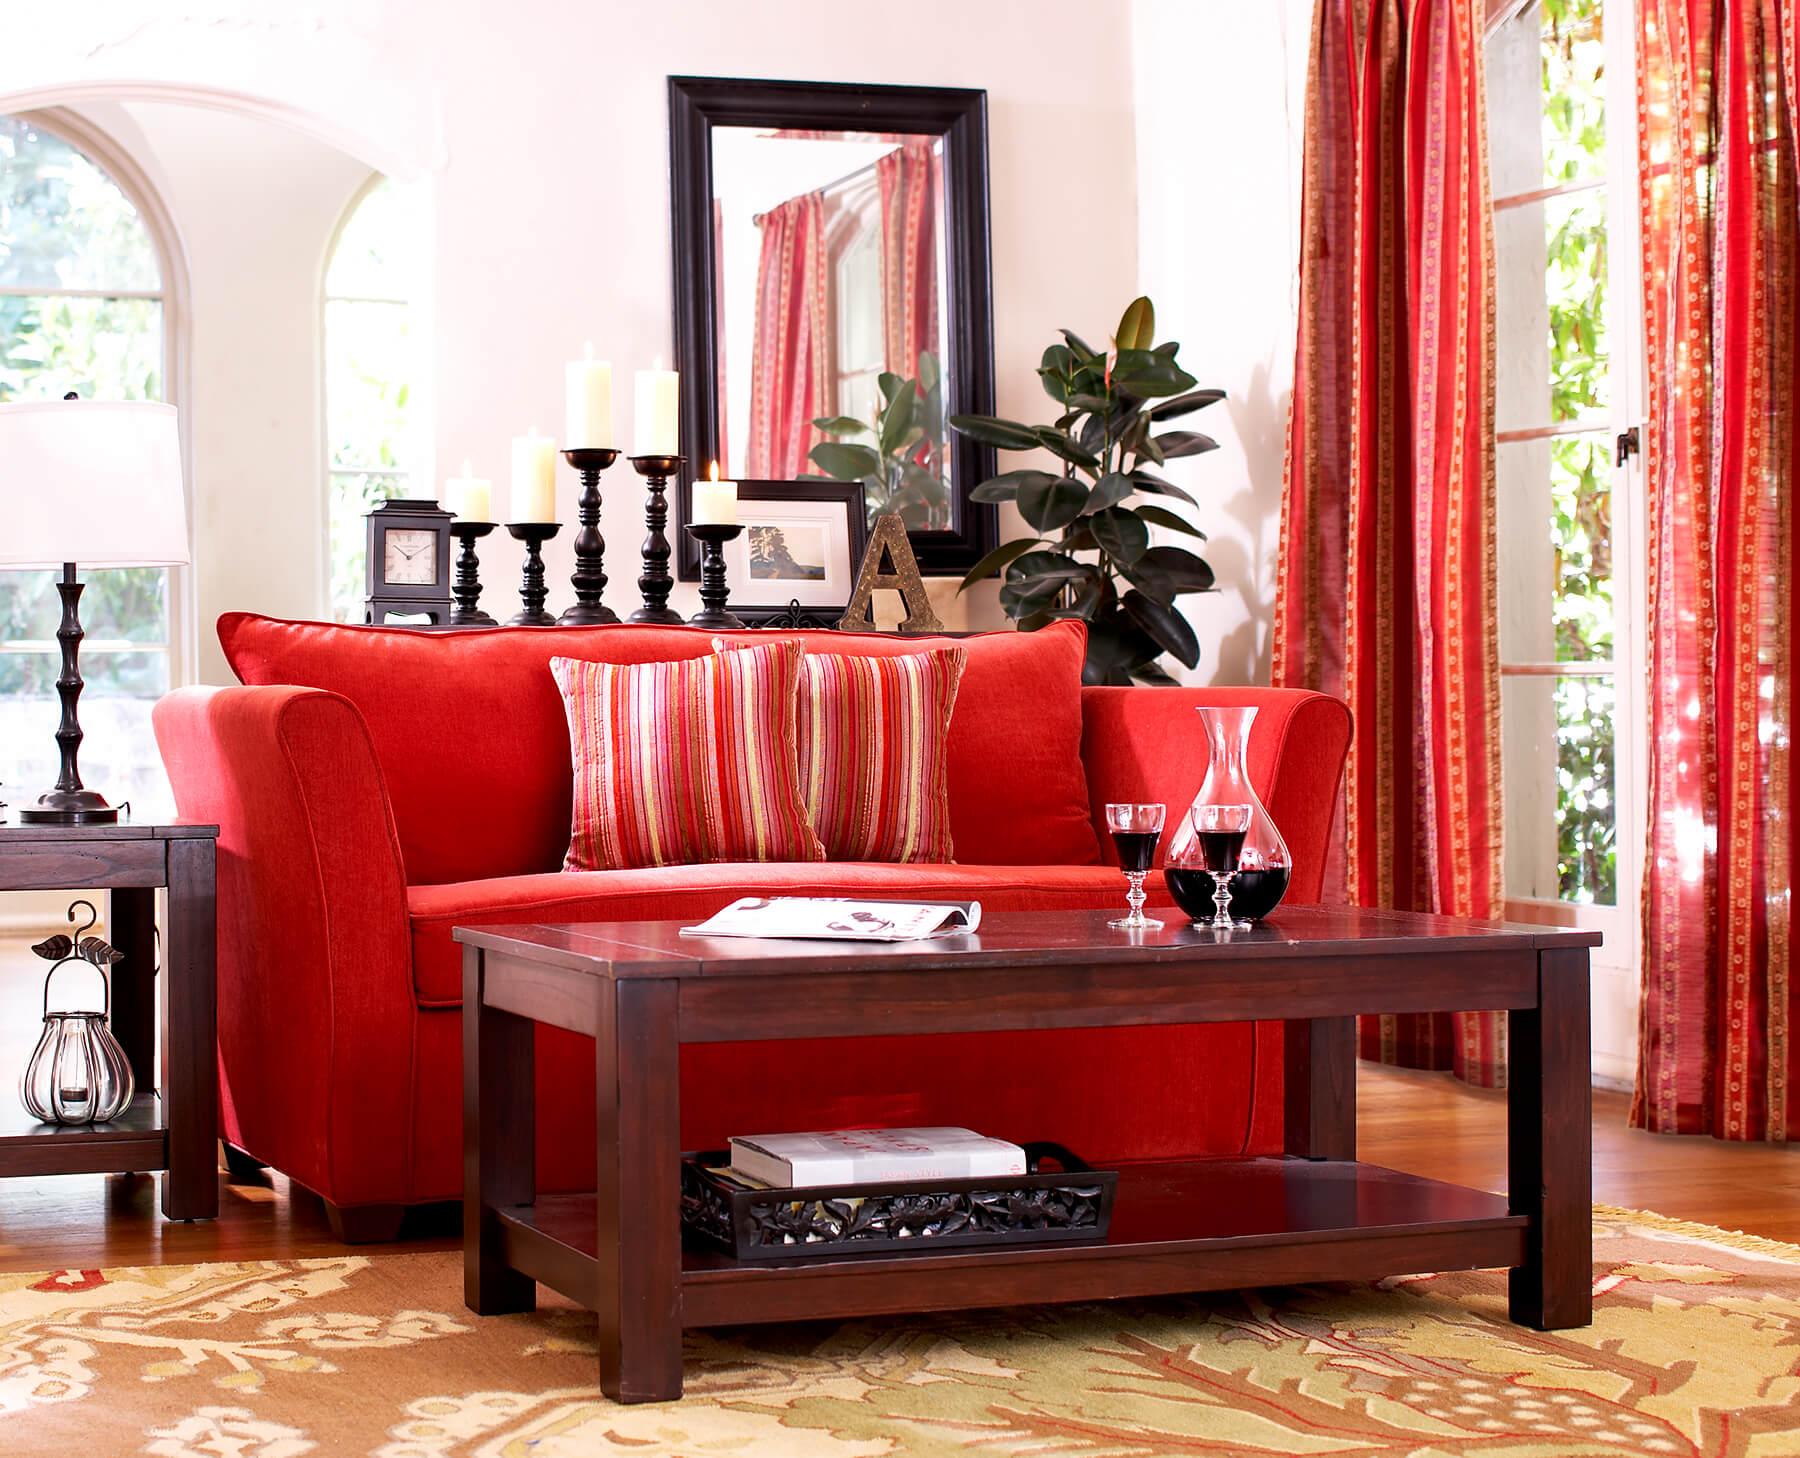 red sofa interior design photography